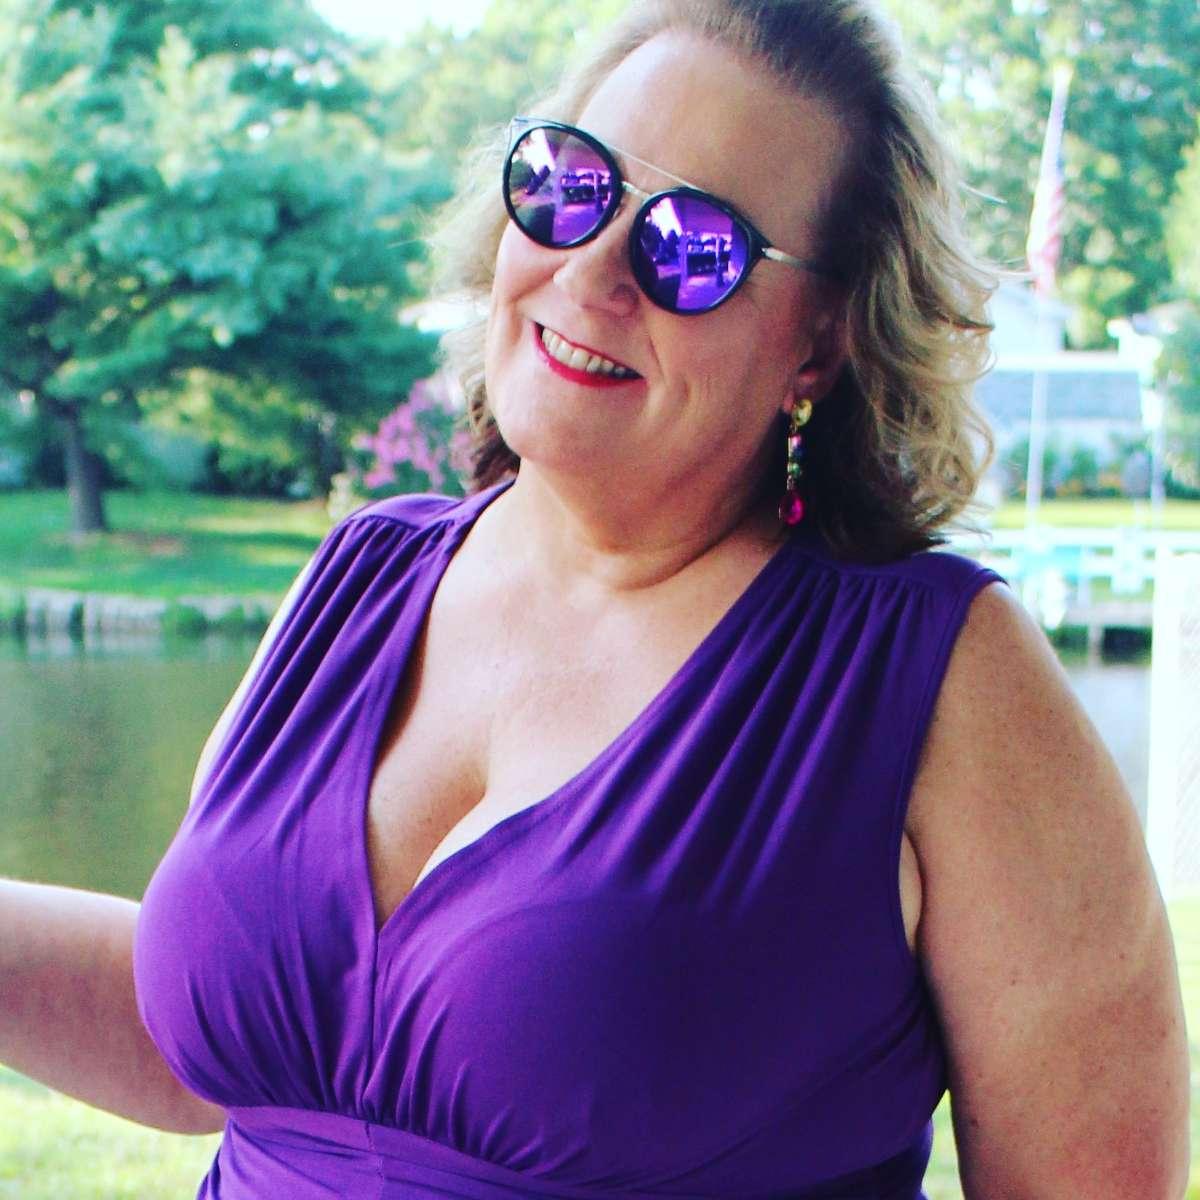 Sixty One Moreno Polarized Sunglasses